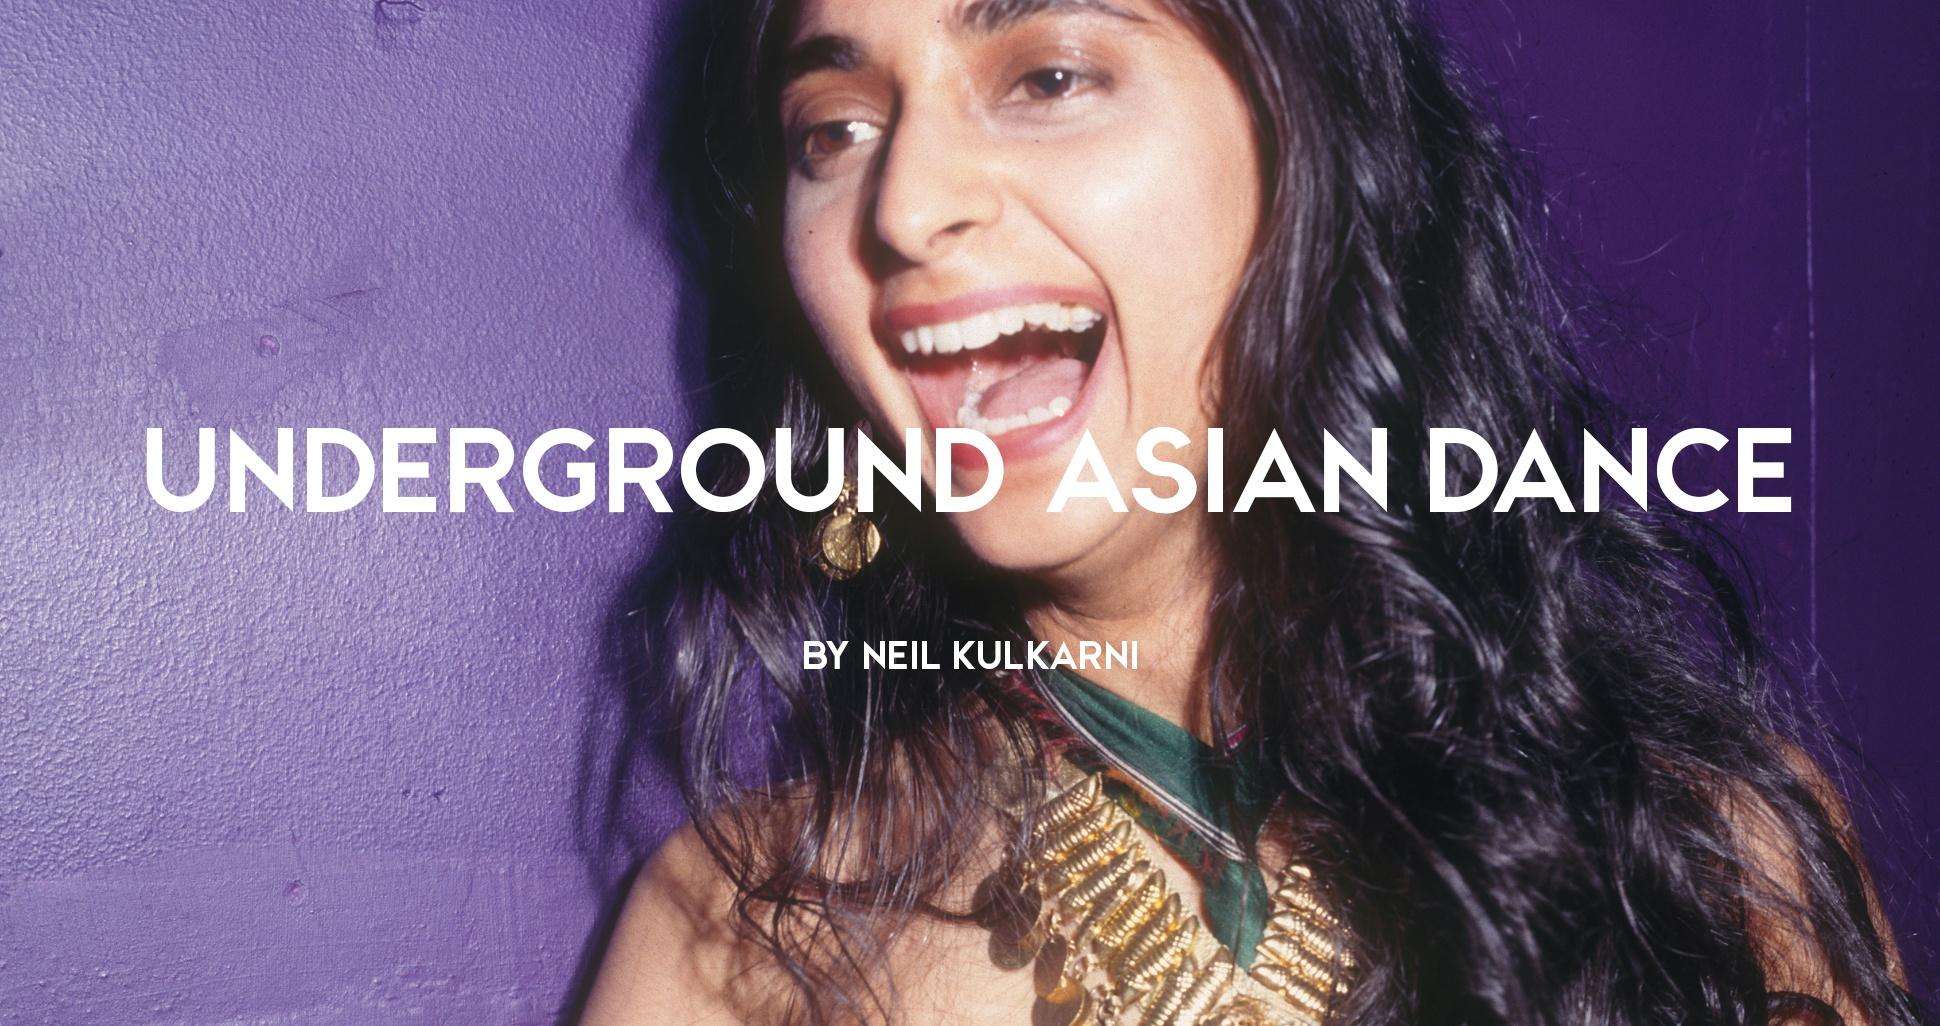 Bhangra dancer at Asian underground dance club night Anokha at the Blue Note, London, 1990s by Adam Friedman